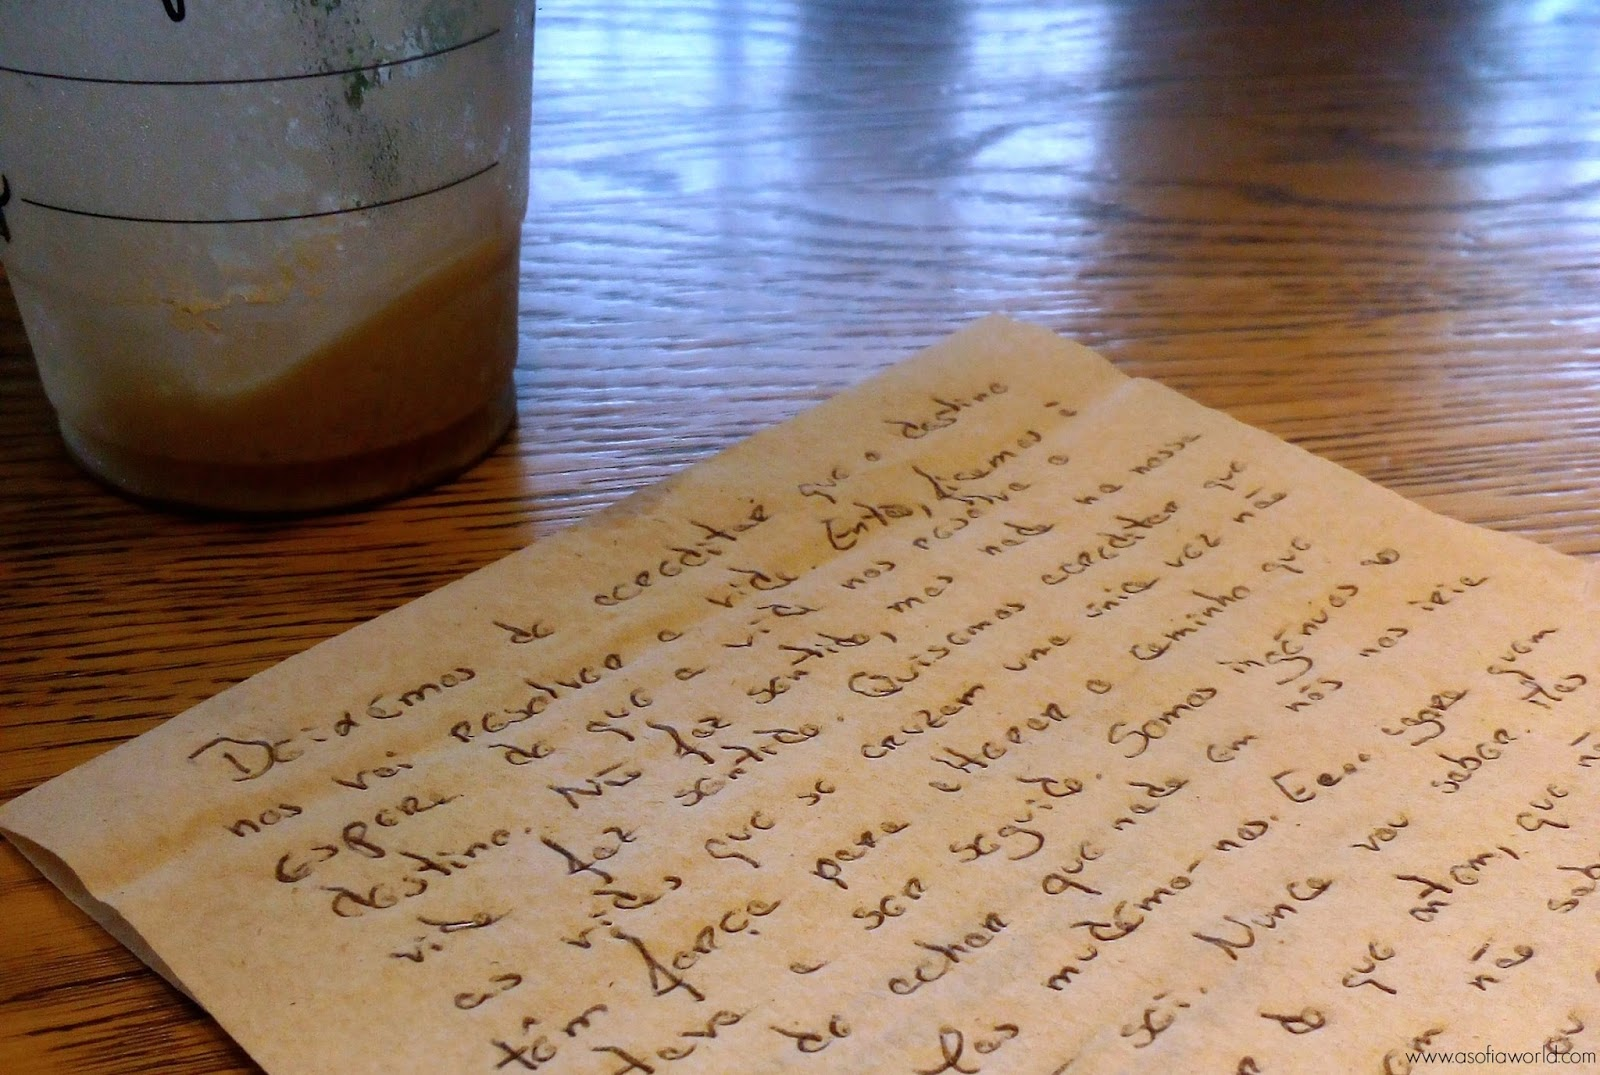 O Tempo num guardanapo de papel do Starbucks